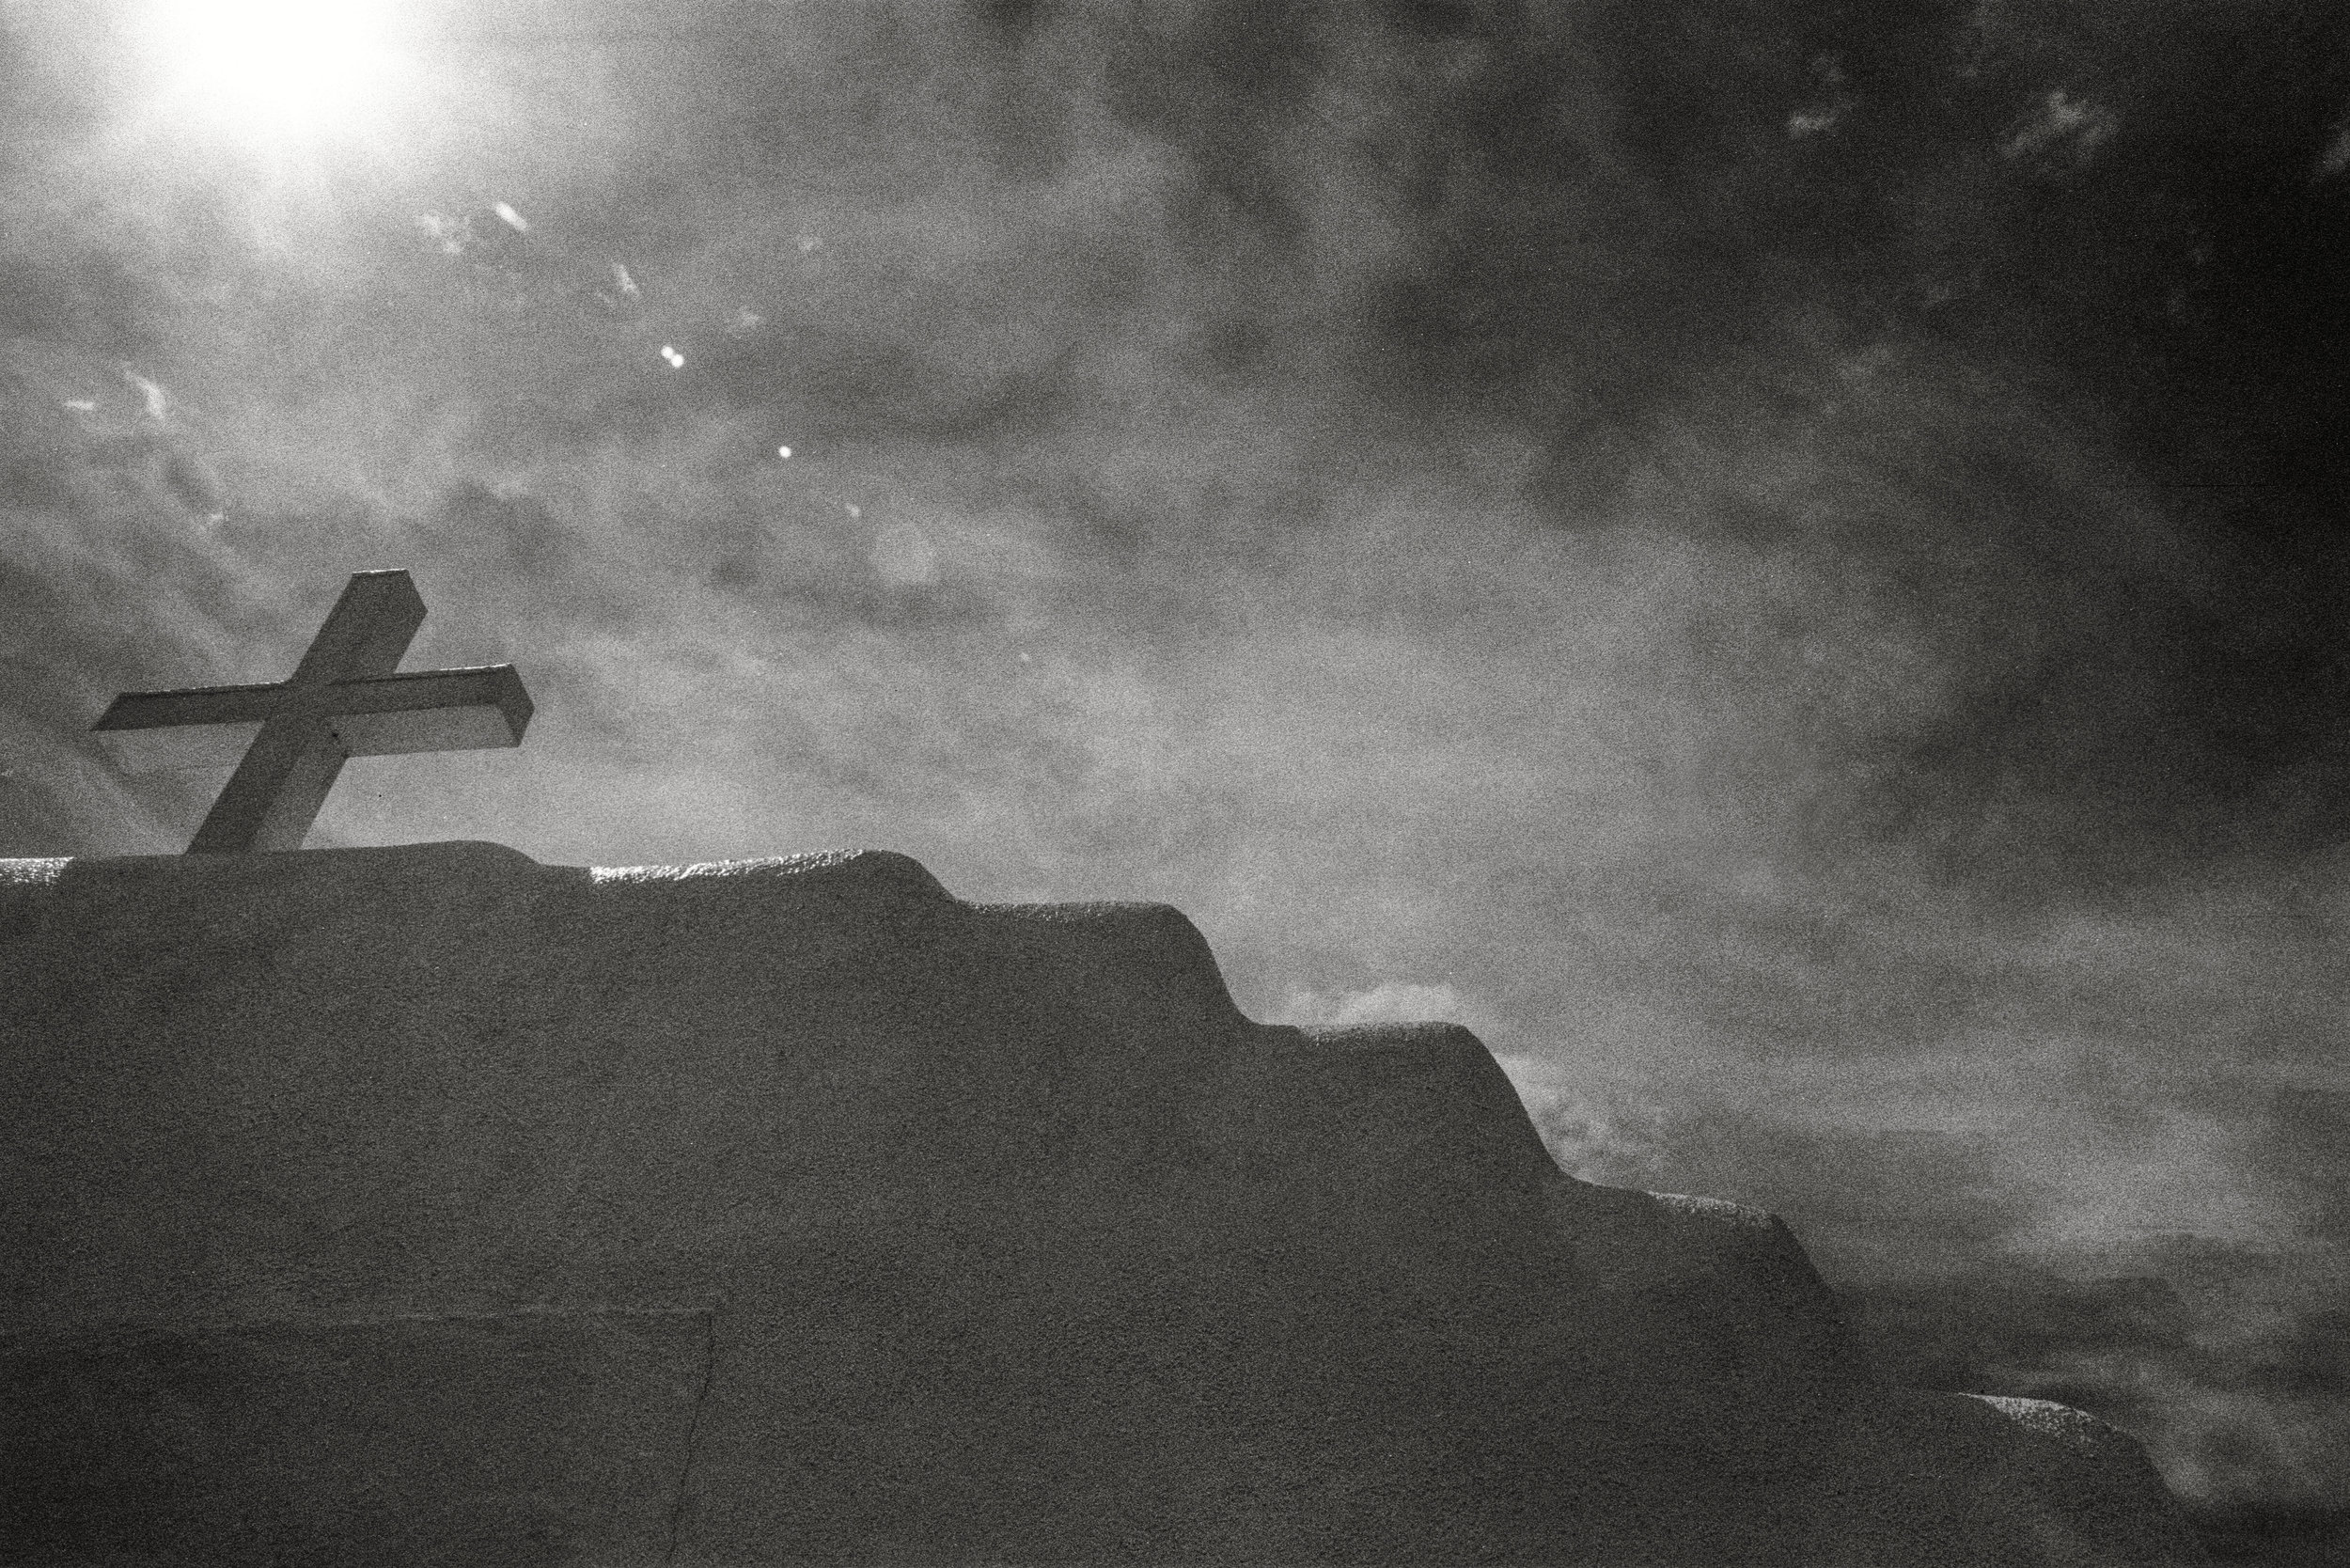 CLICK on Photo: New Mexico 2018 - Pueblo Mission Study Taos Pueblo, New Mexico 2018 (Ultra Max 400 BW Film)